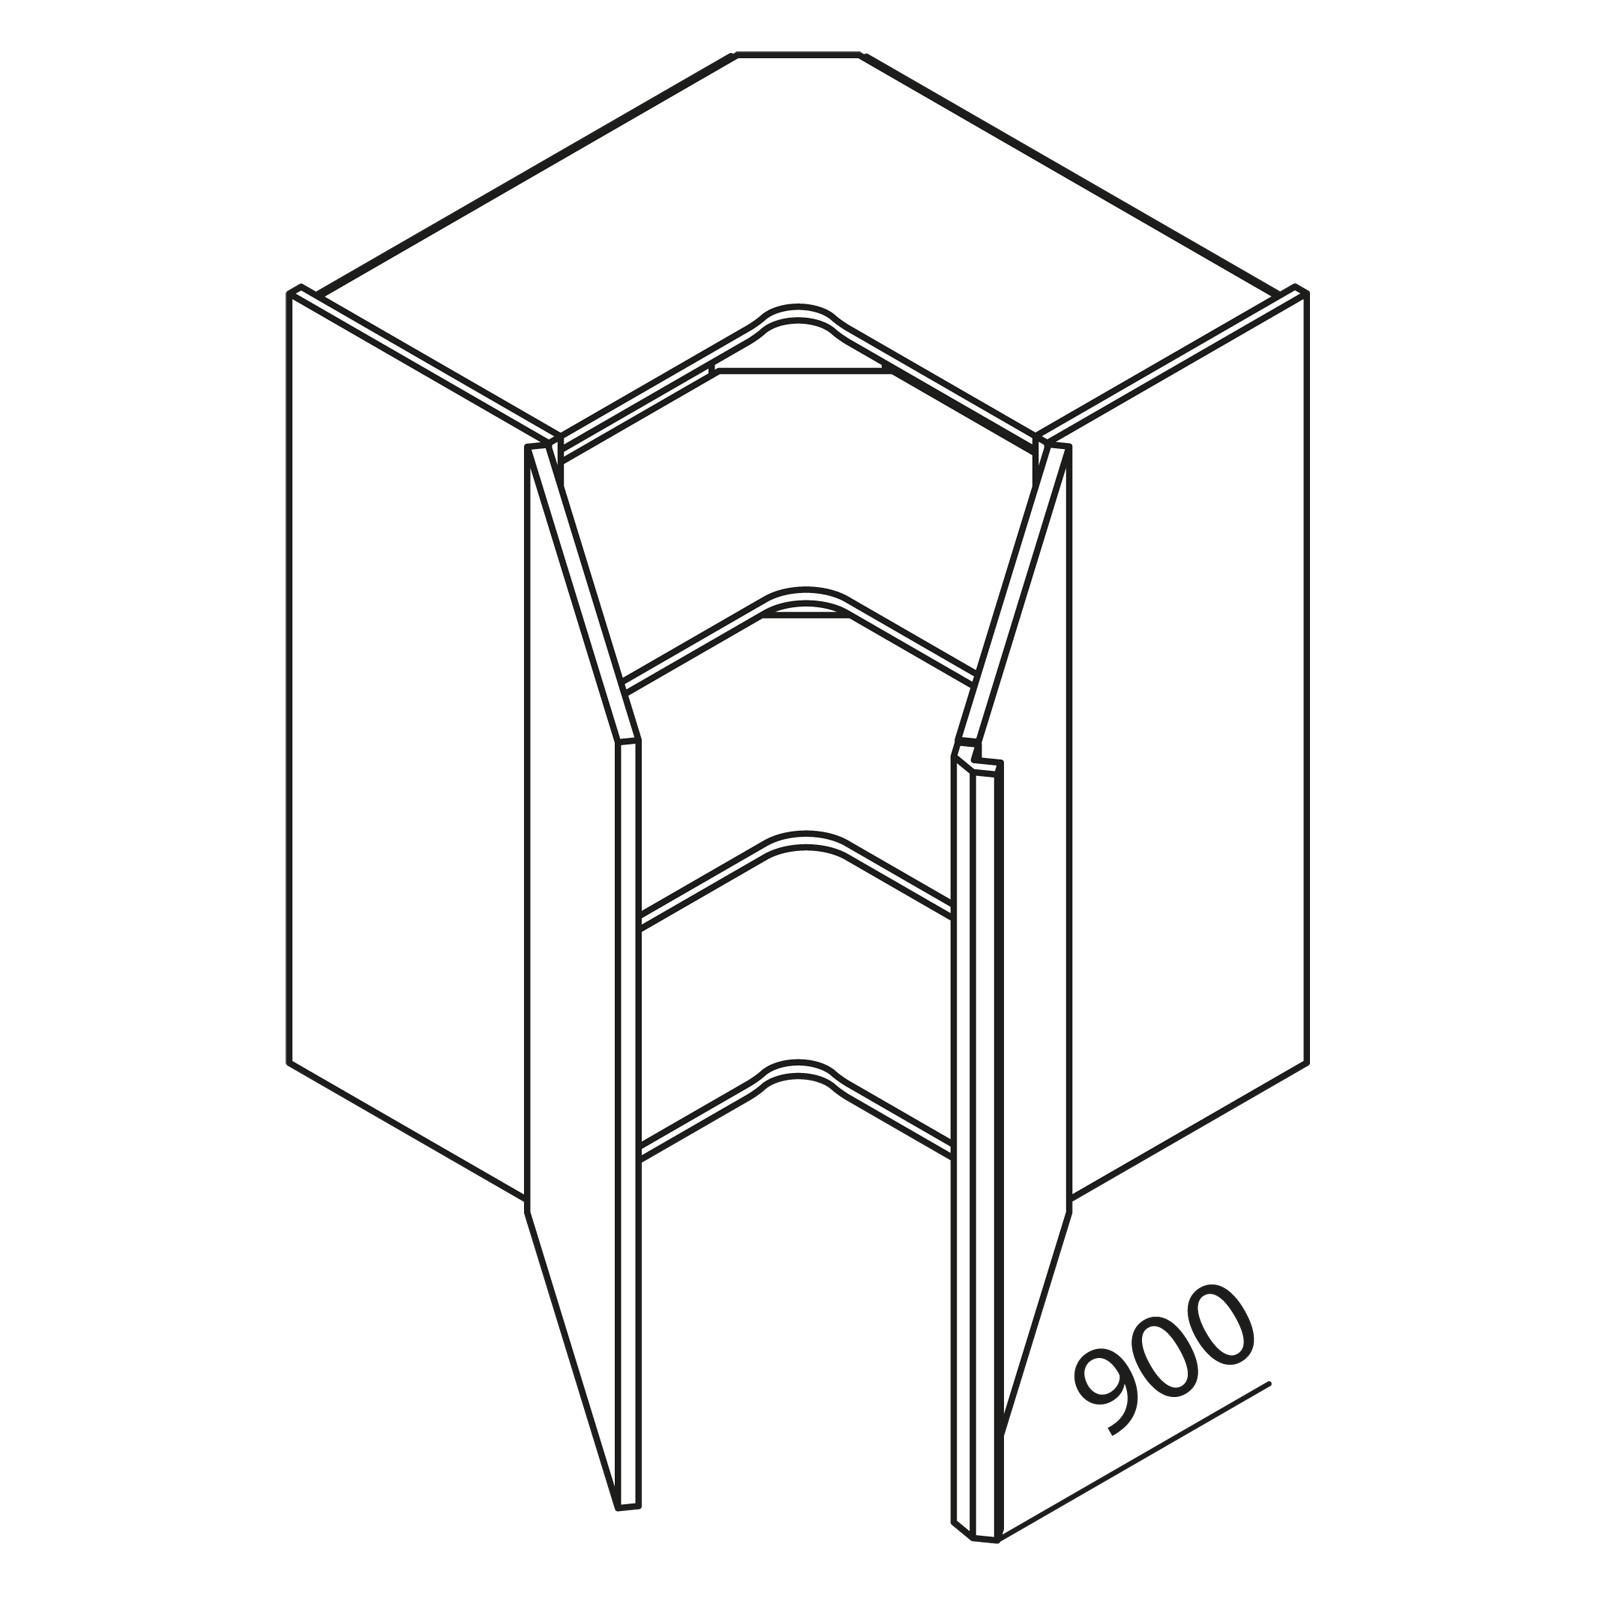 nolte k chen h ngeschrank eckschrank he65 90 r. Black Bedroom Furniture Sets. Home Design Ideas